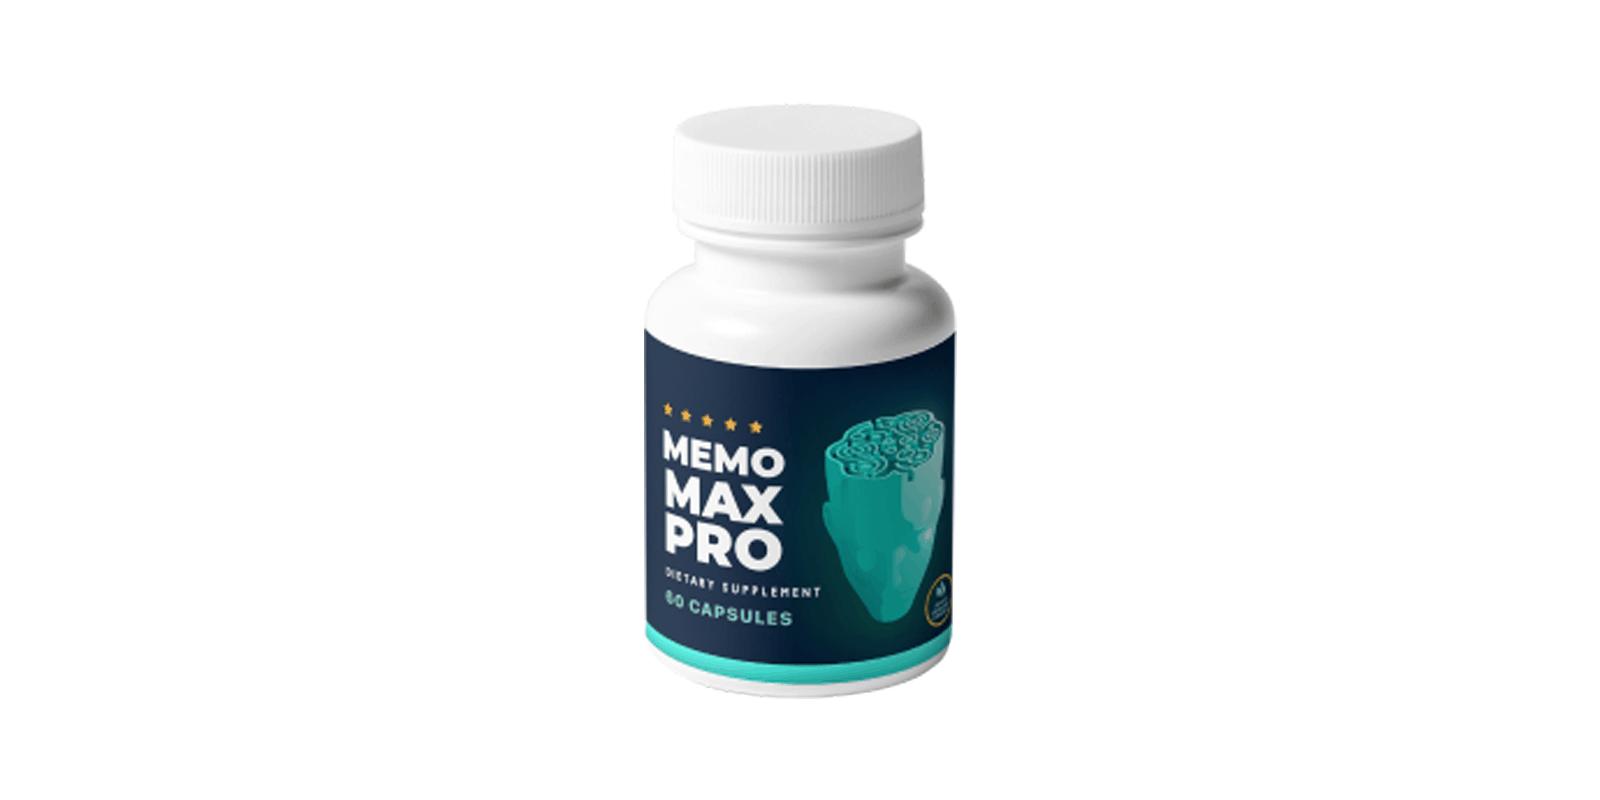 Memo Max Pro reviews